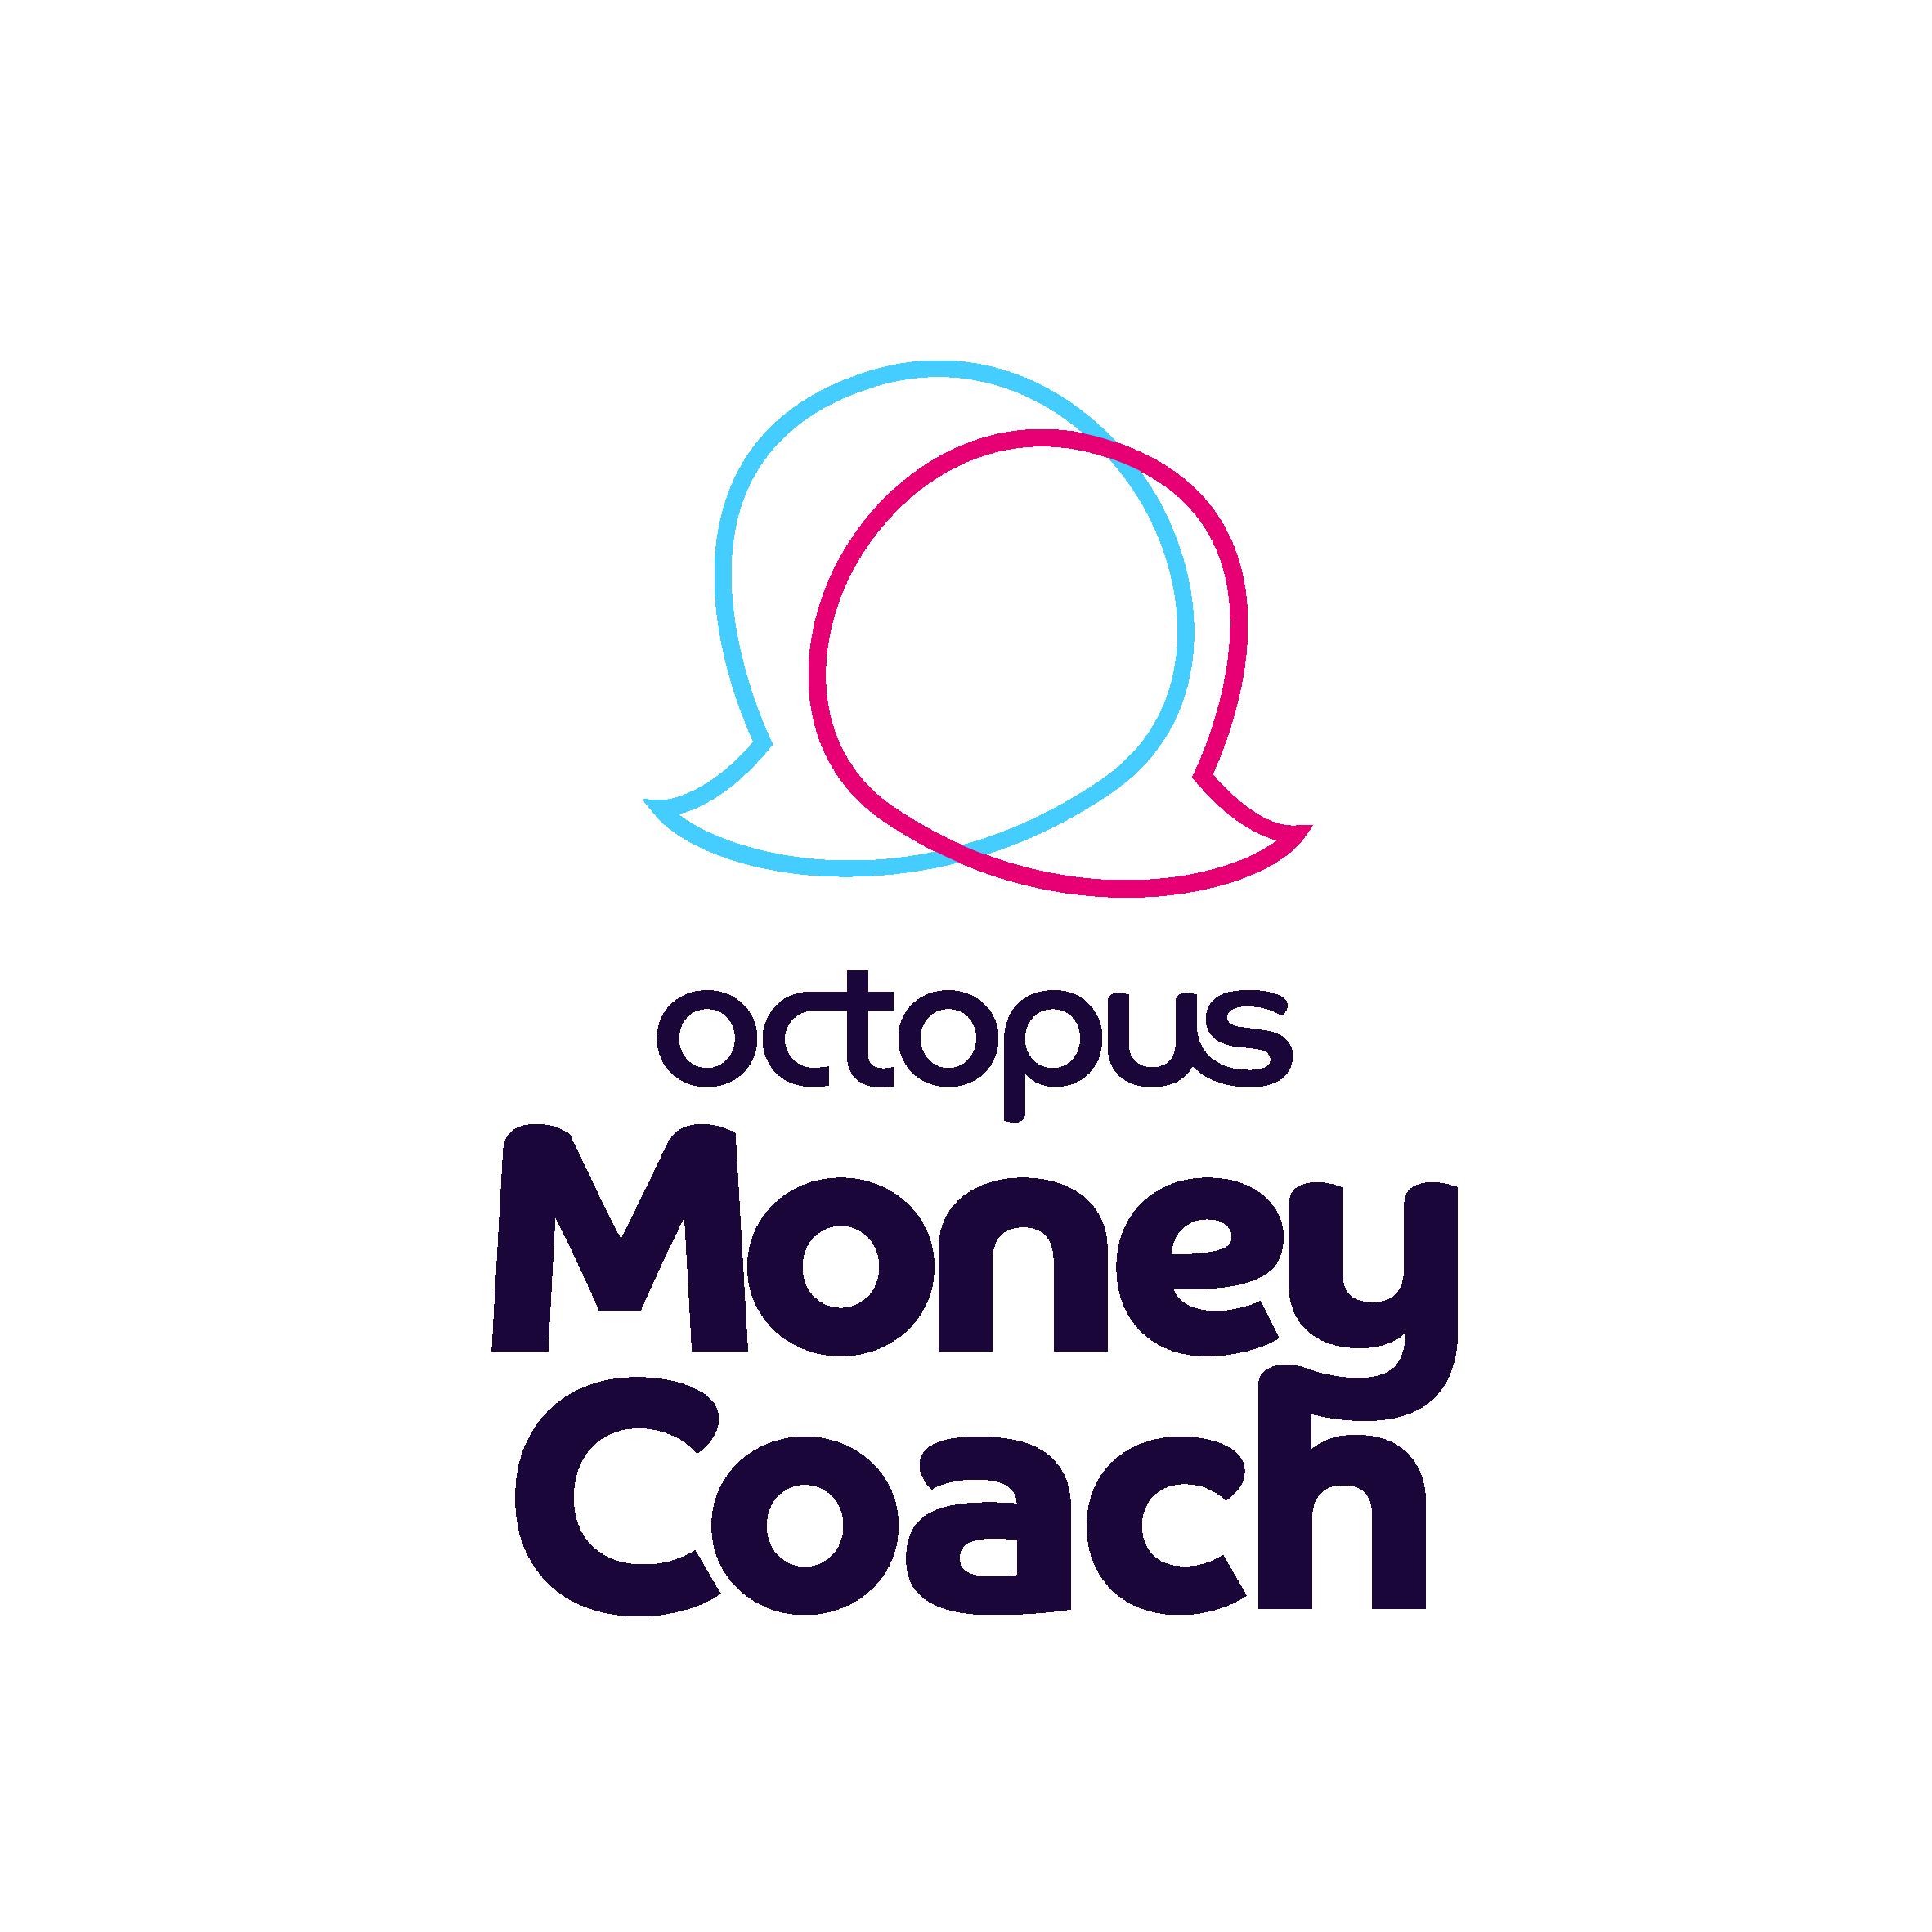 Octopus MoneyCoach